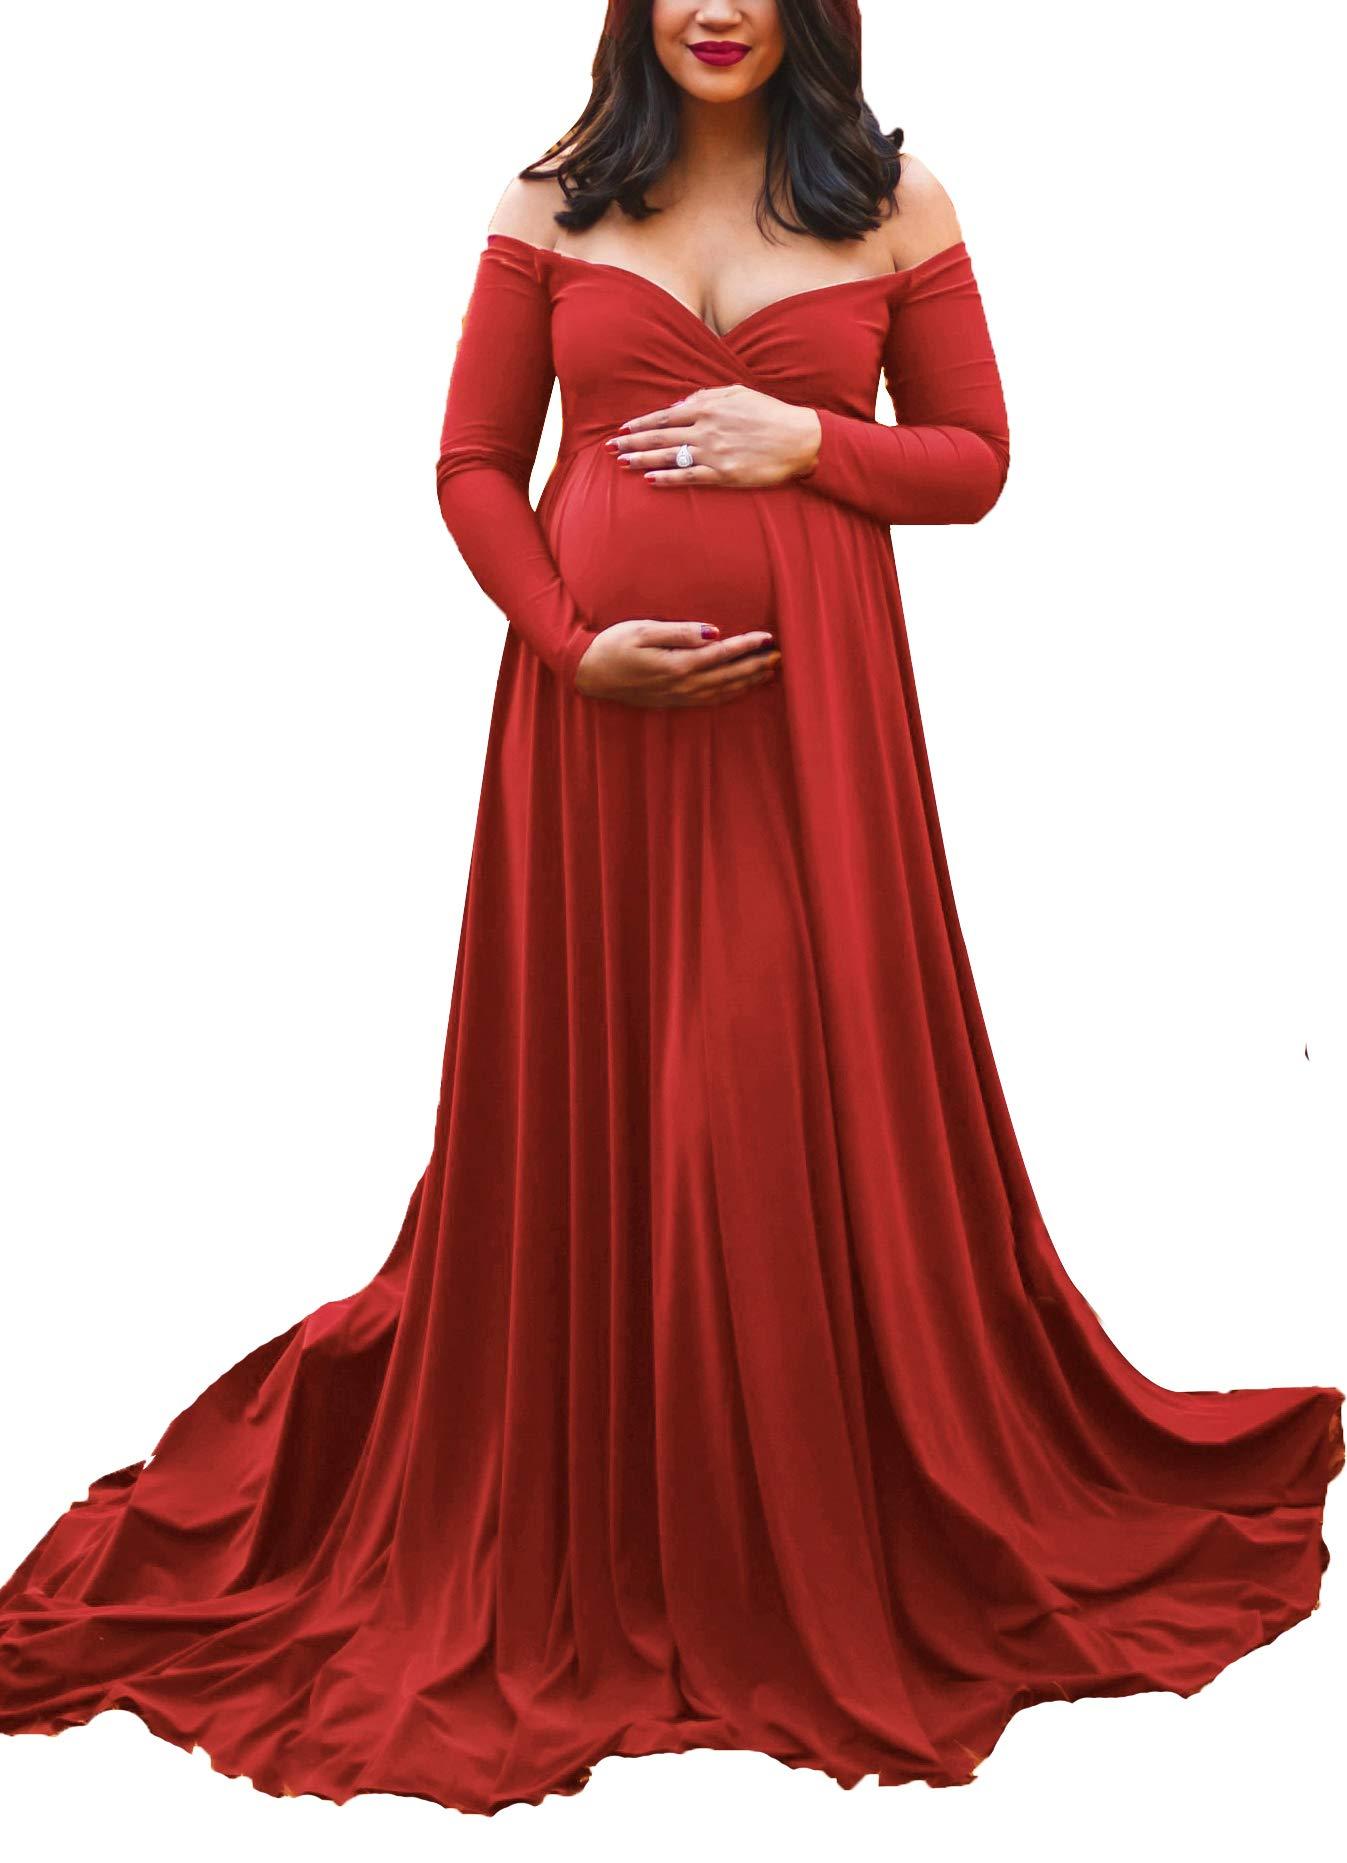 Red Dress - Women Sequin Bridesmaid Dress Sleeveless Maxi Evening Prom Dresses